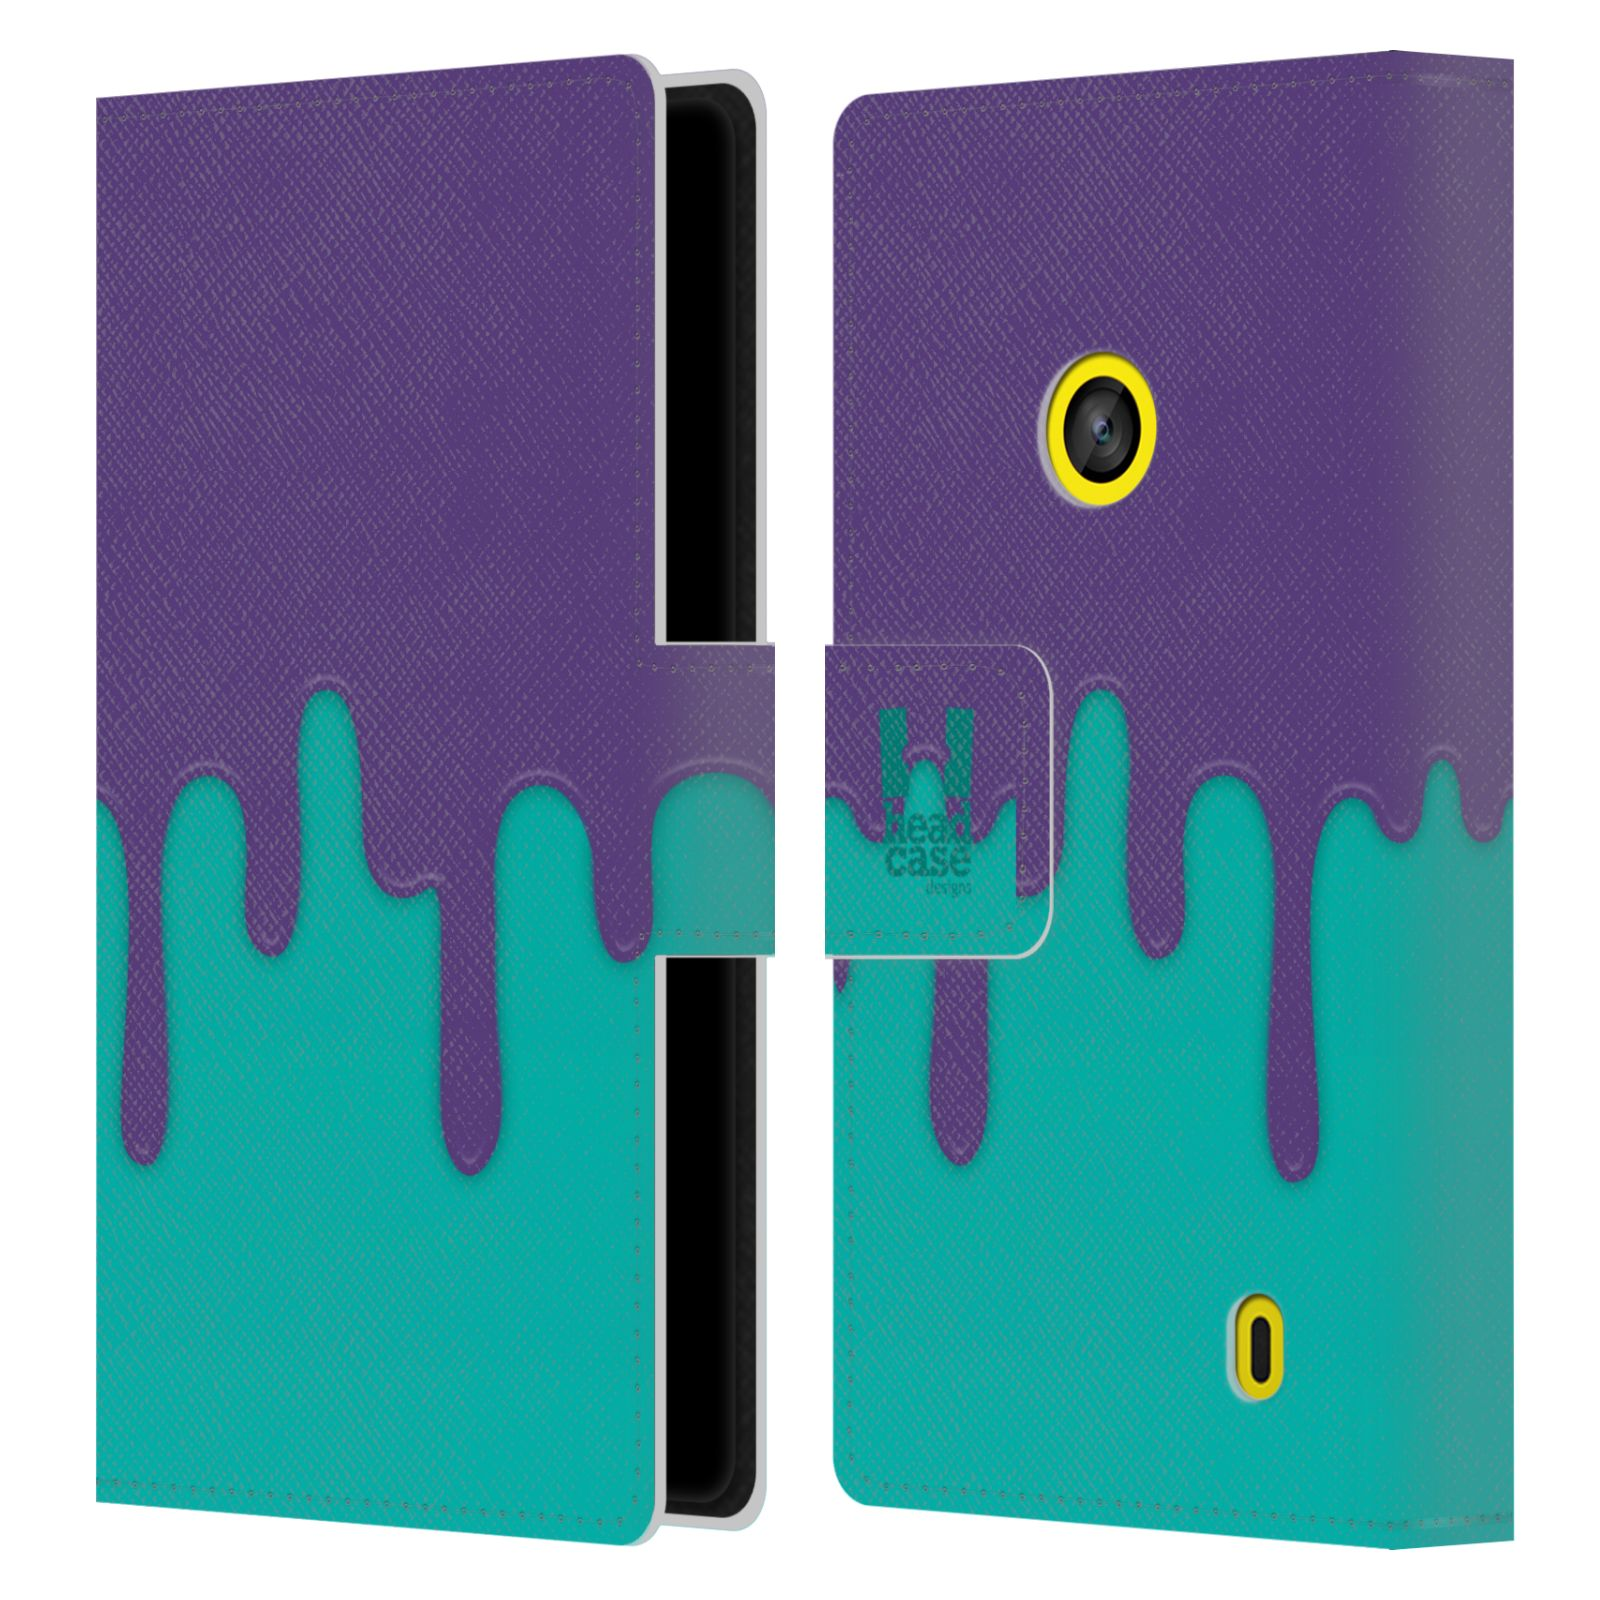 HEAD CASE Flipové pouzdro pro mobil NOKIA LUMIA 520 / 525 Rozlitá barva fialová a tyrkysová